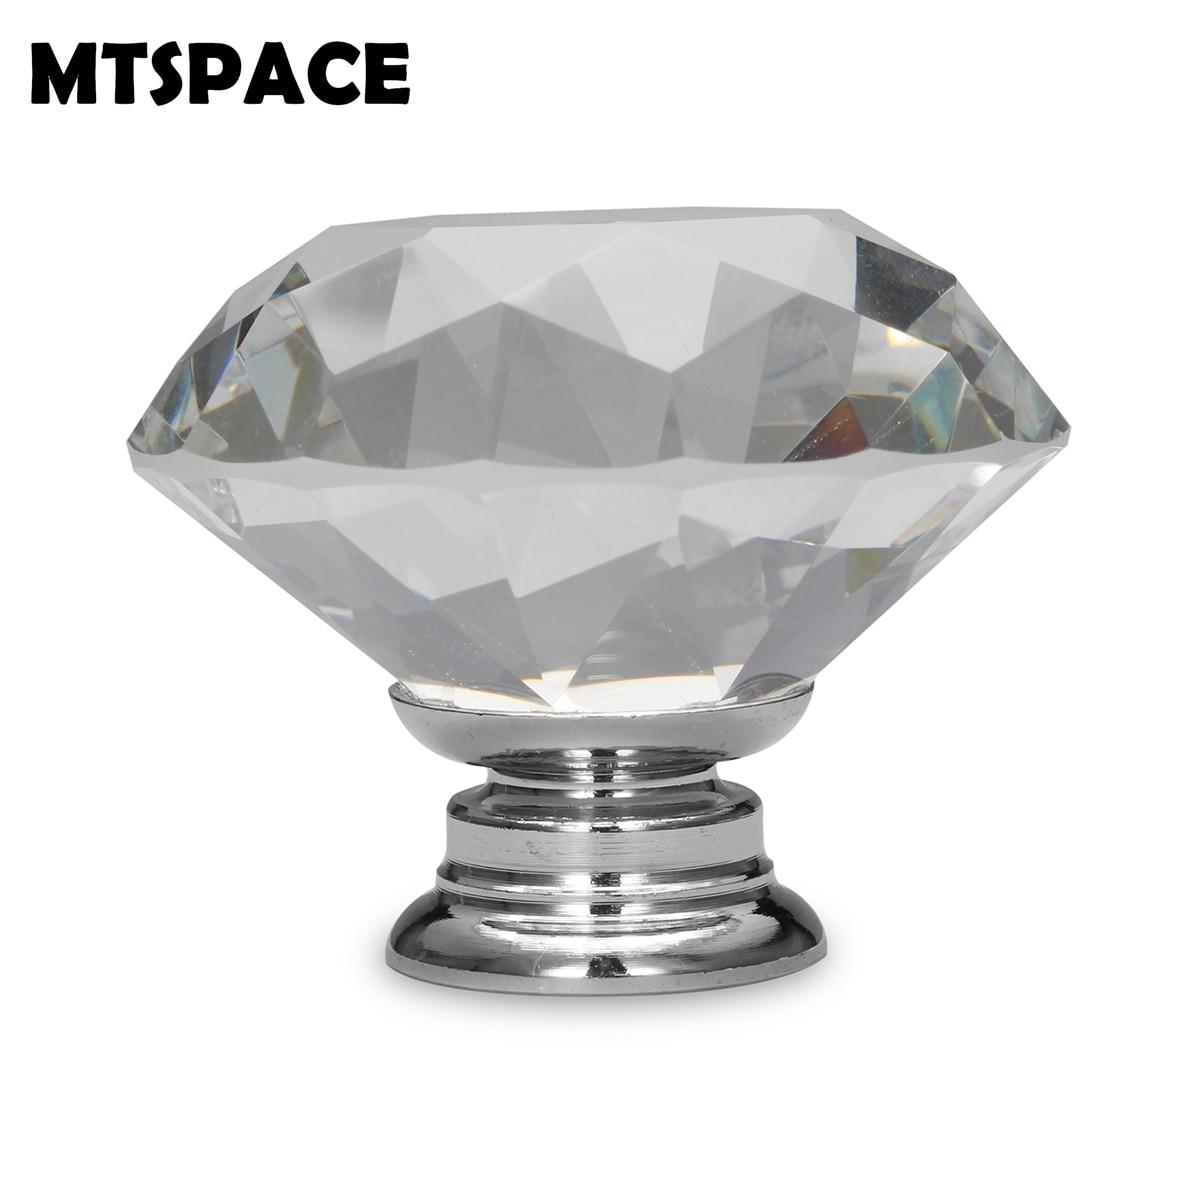 MTSPACE 1pcs 30mm Diamond Shape Design Crystal Glass Knobs Cupboard Drawer Pull Kitchen Cabinet Door Wardrobe Handles Hardware